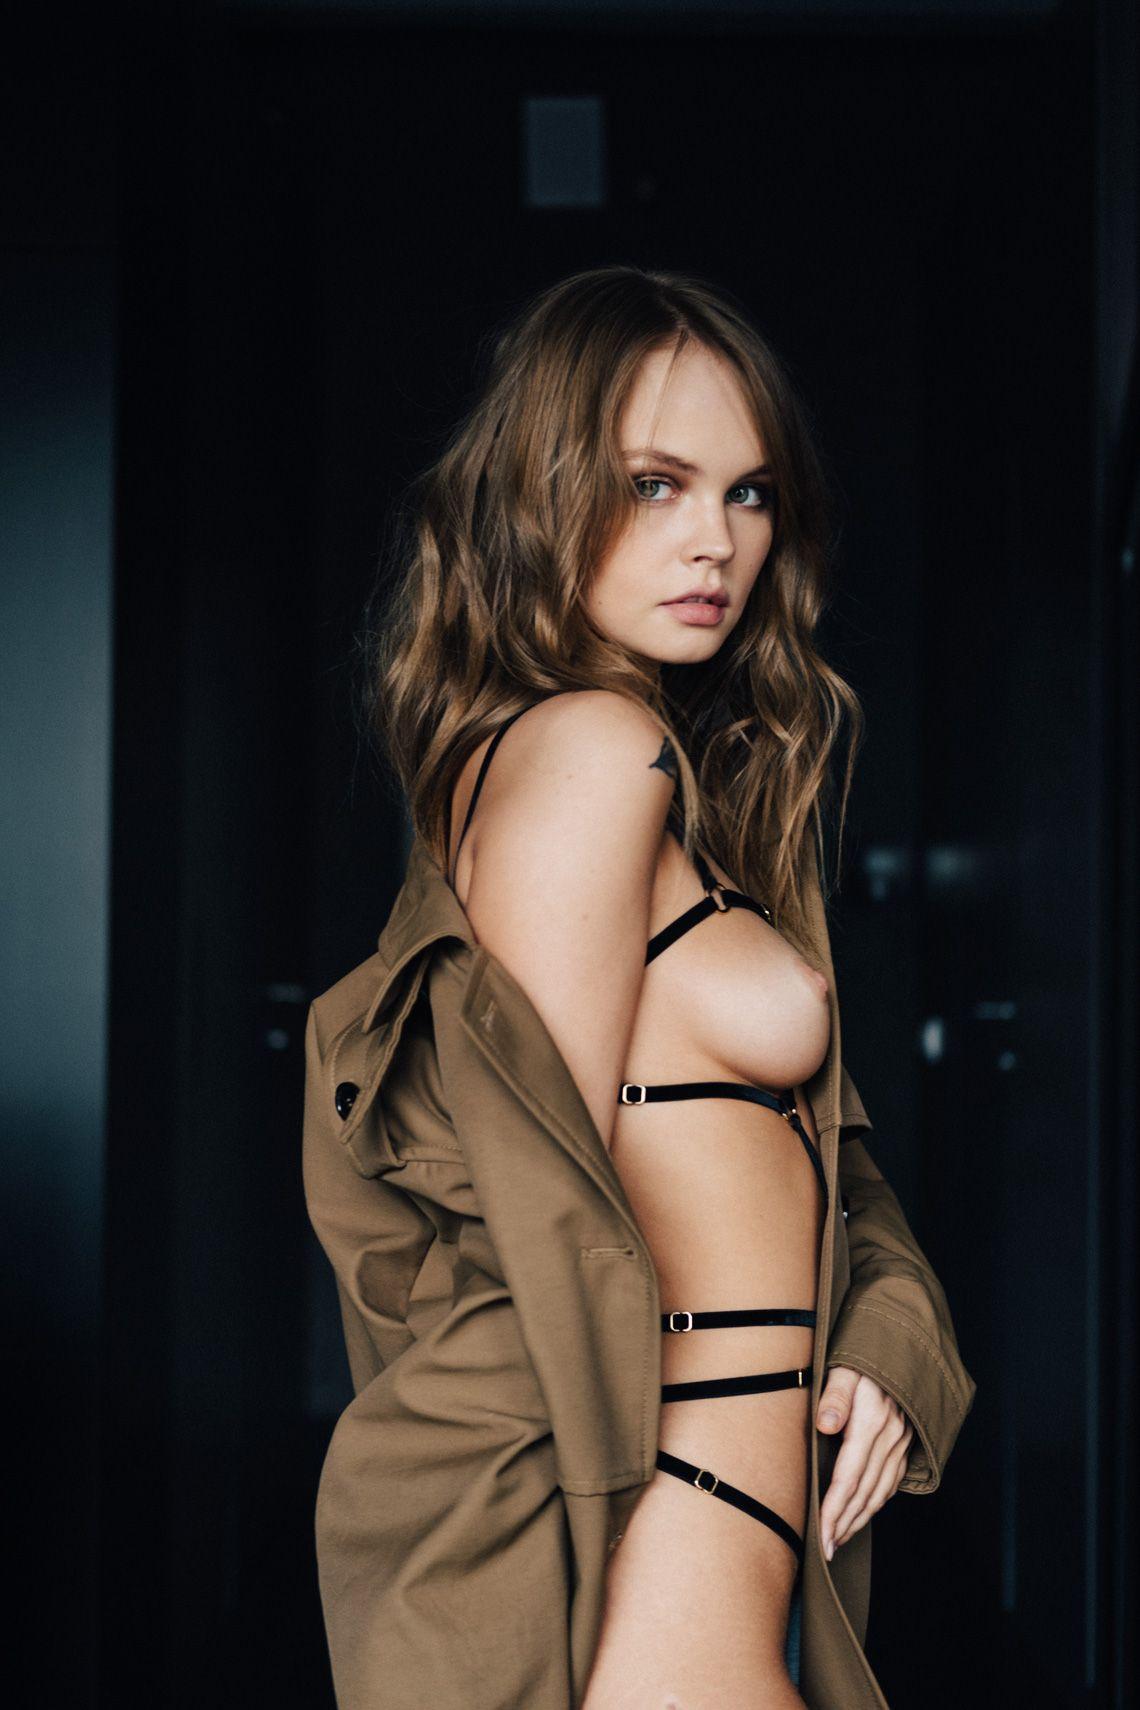 nudes (69 photos), Pussy Celebrites fotos